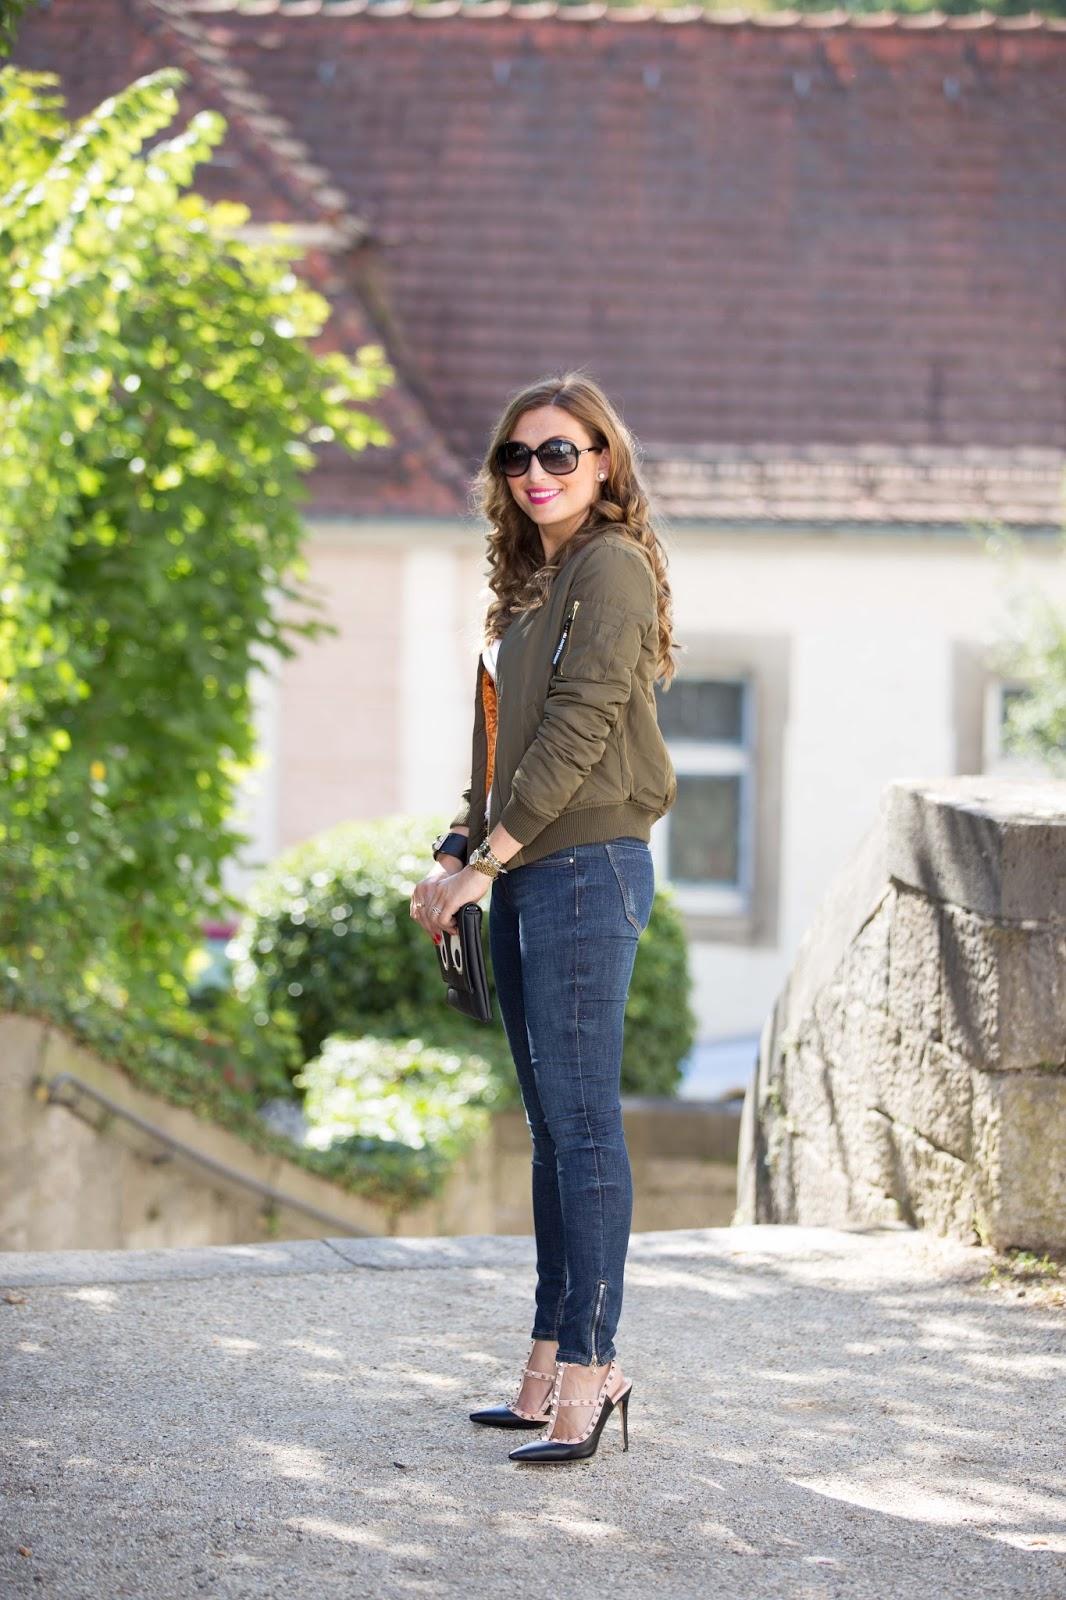 Bomberjacke-khaki jacke-Fashionstylebyjohanna-fashionblog-frankfurt blogger-fashionblogger-bloggerdeutschland-lifestyleblog-modeblog-frankfurt-germanblogger-styleblog-bundfaltenhose-a-la-streetwear-chic-